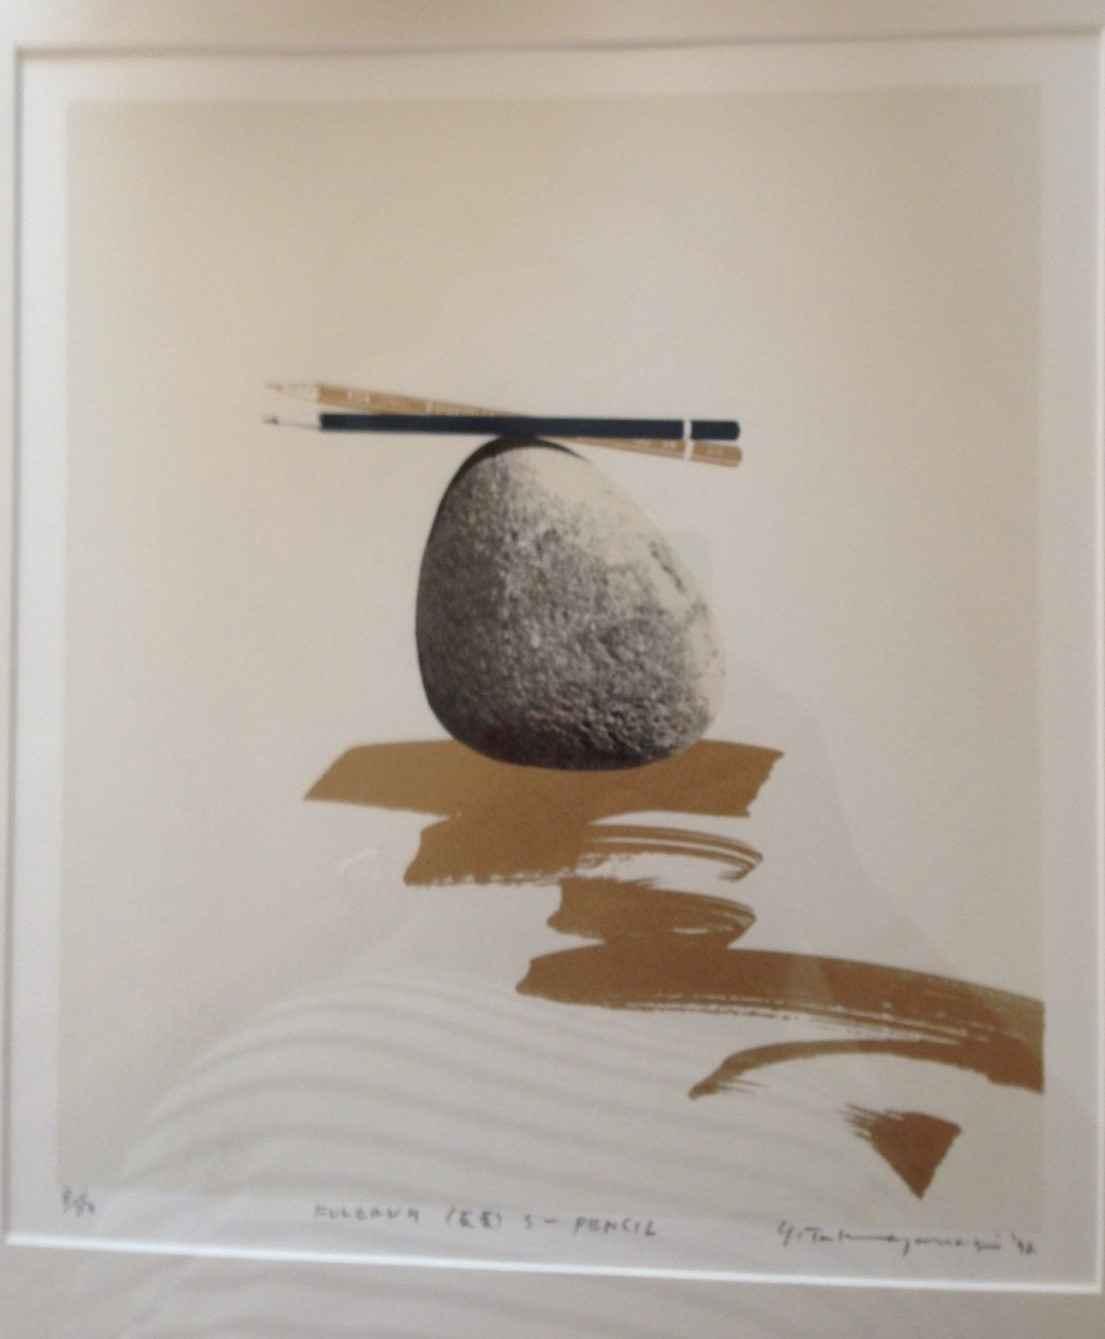 Fulcrum S – Pencil by  Yutaka Takayanagi - Masterpiece Online